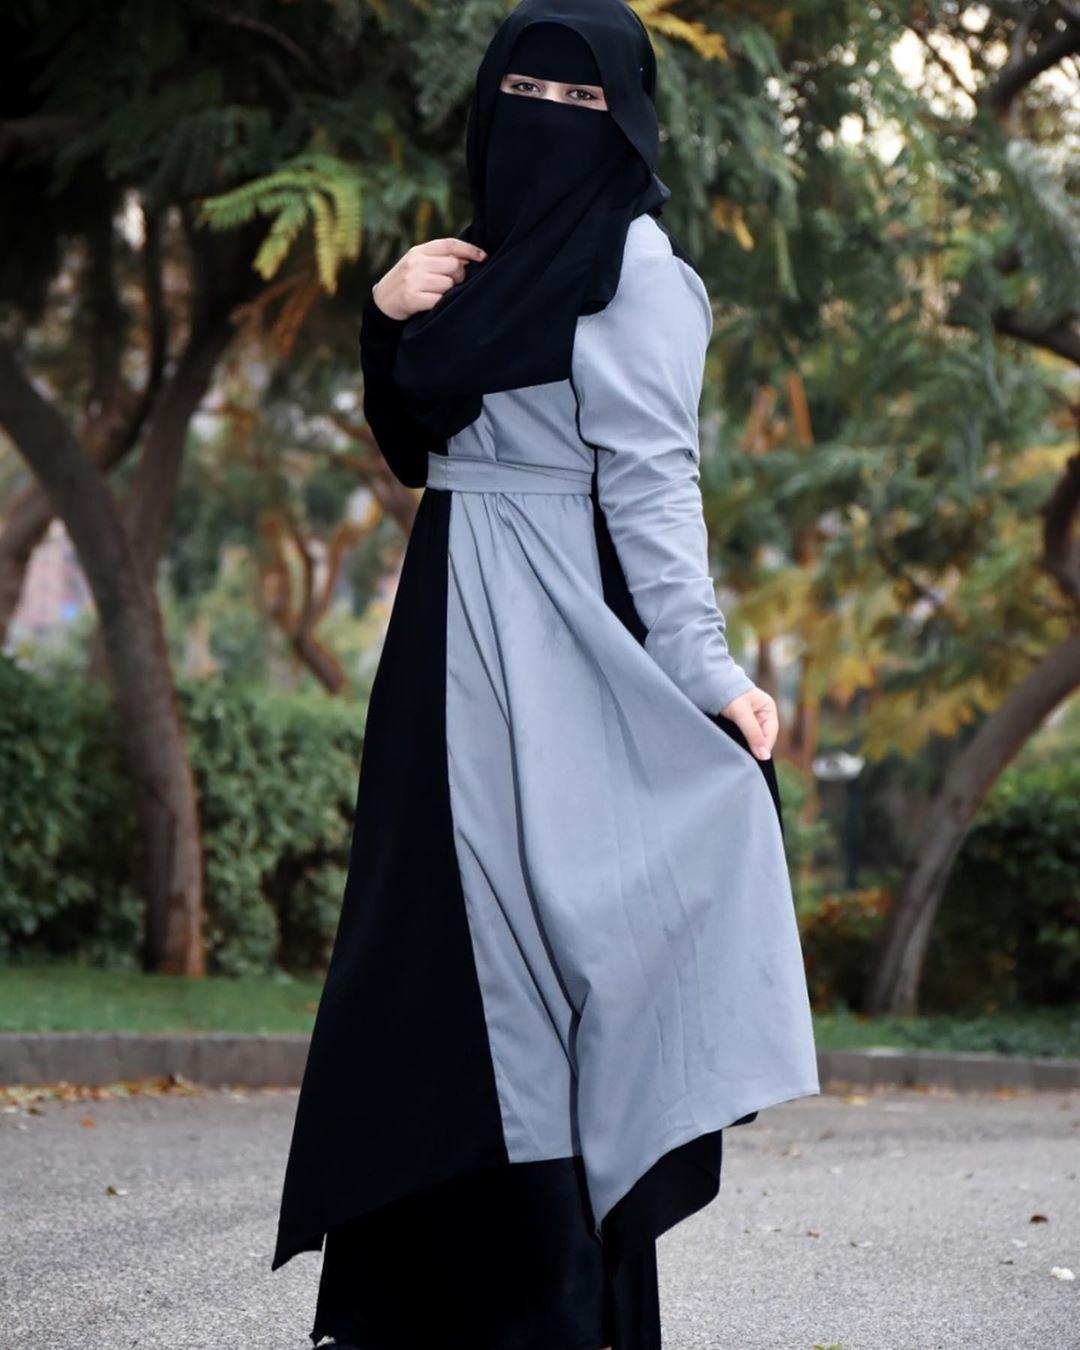 العبايه علي الجميله Rodyhamdy Muslim Fashion Hijab Niqab Fashion Niqab